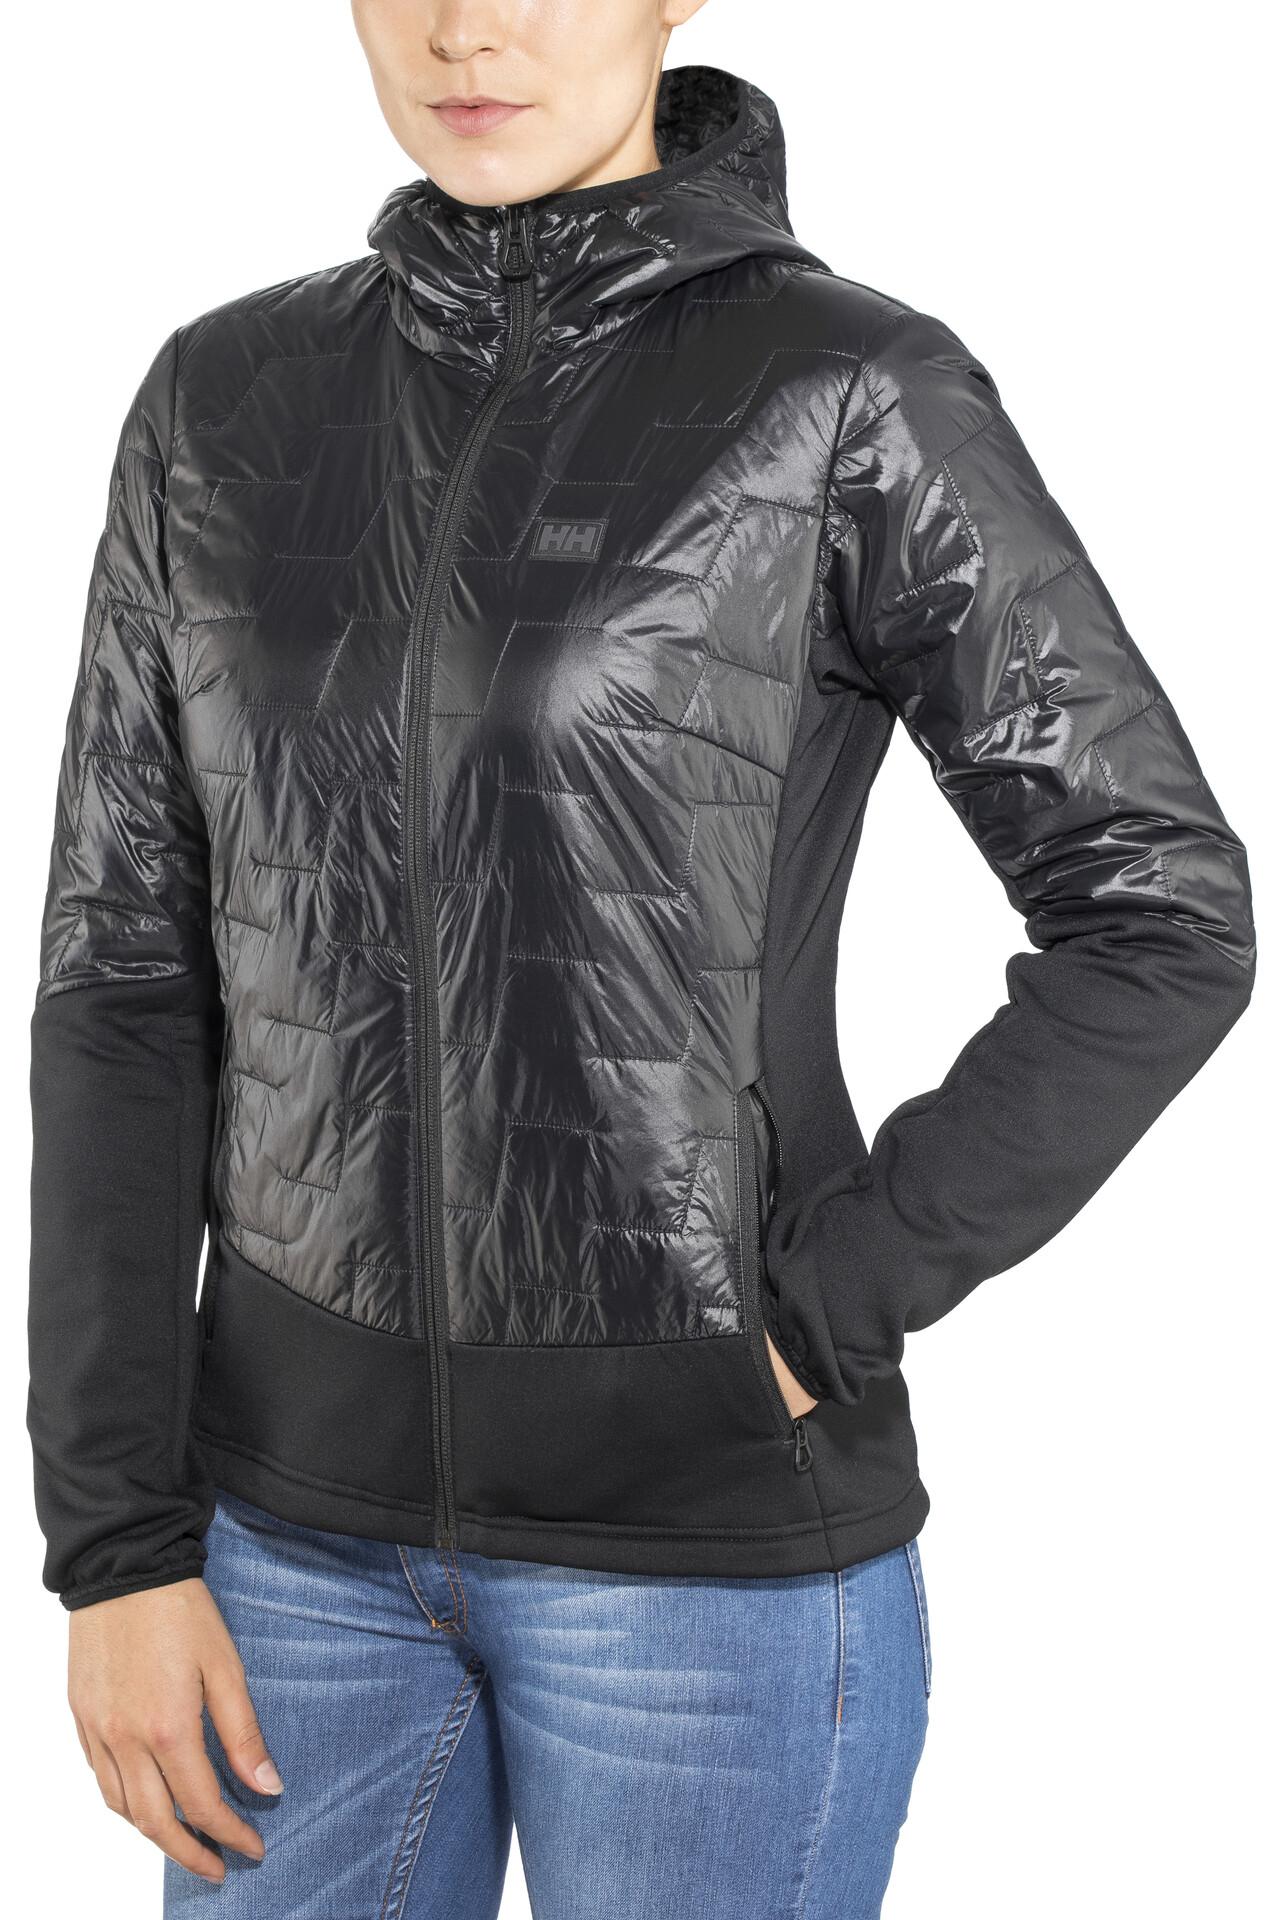 Helly Hansen Lifaloft Hybrid Insulator Jacket Damen black